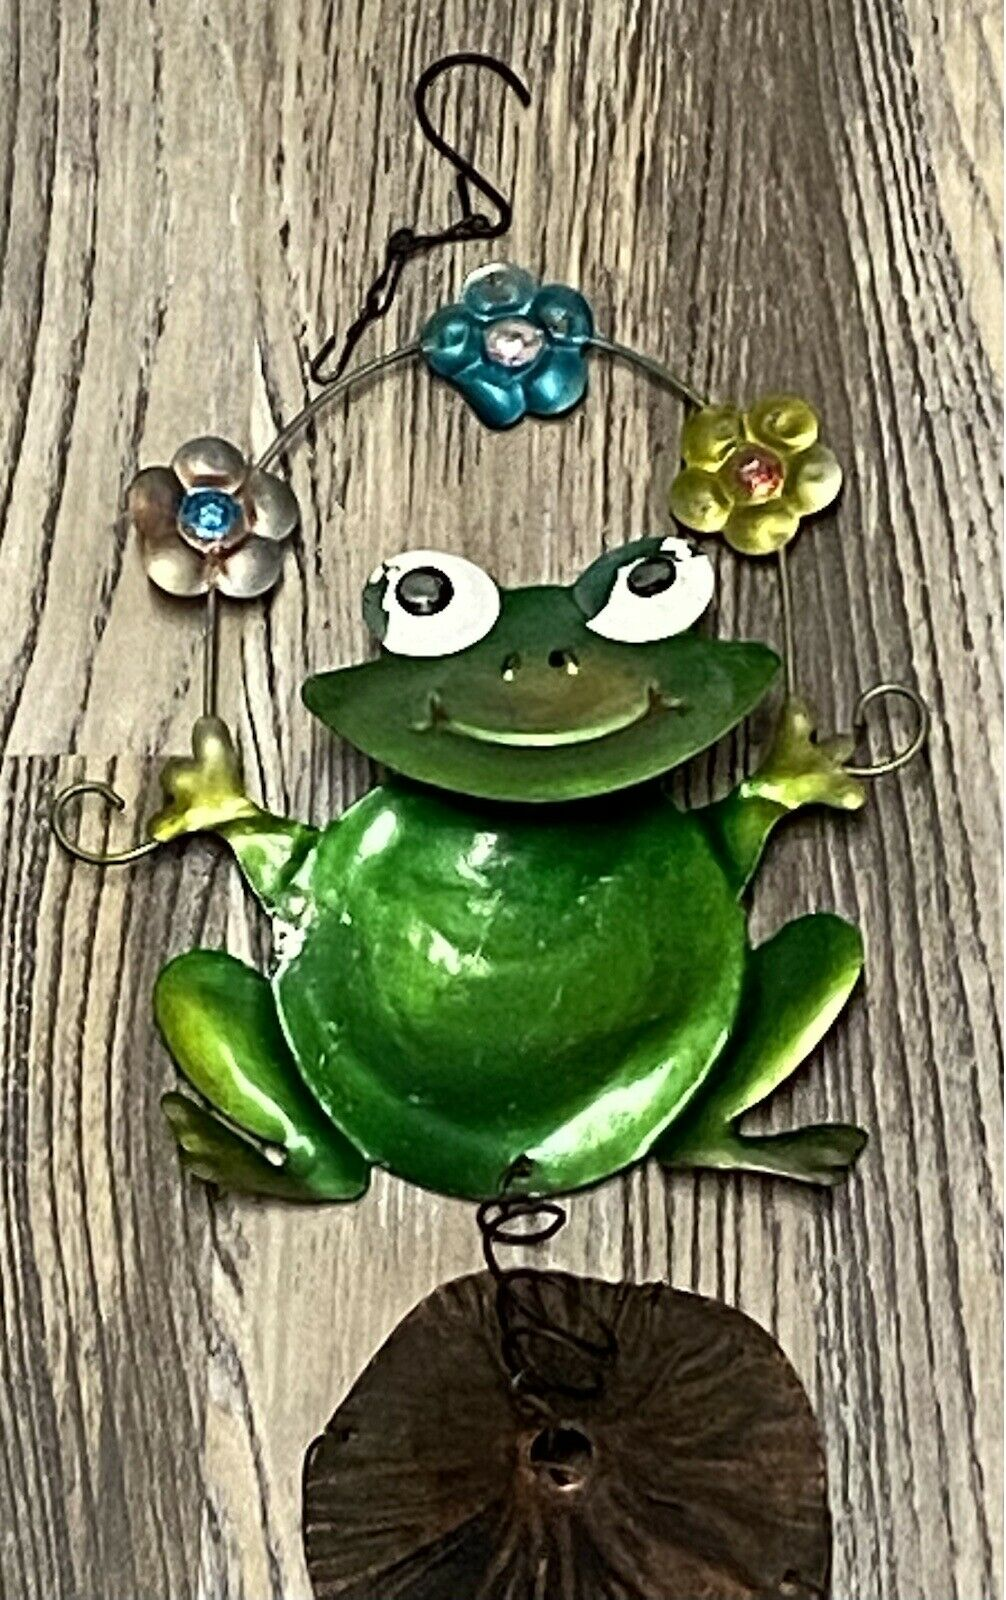 Green Frog Wind Chime, Flower Garden Lawn Outdoor whimsical Garden Home Decor